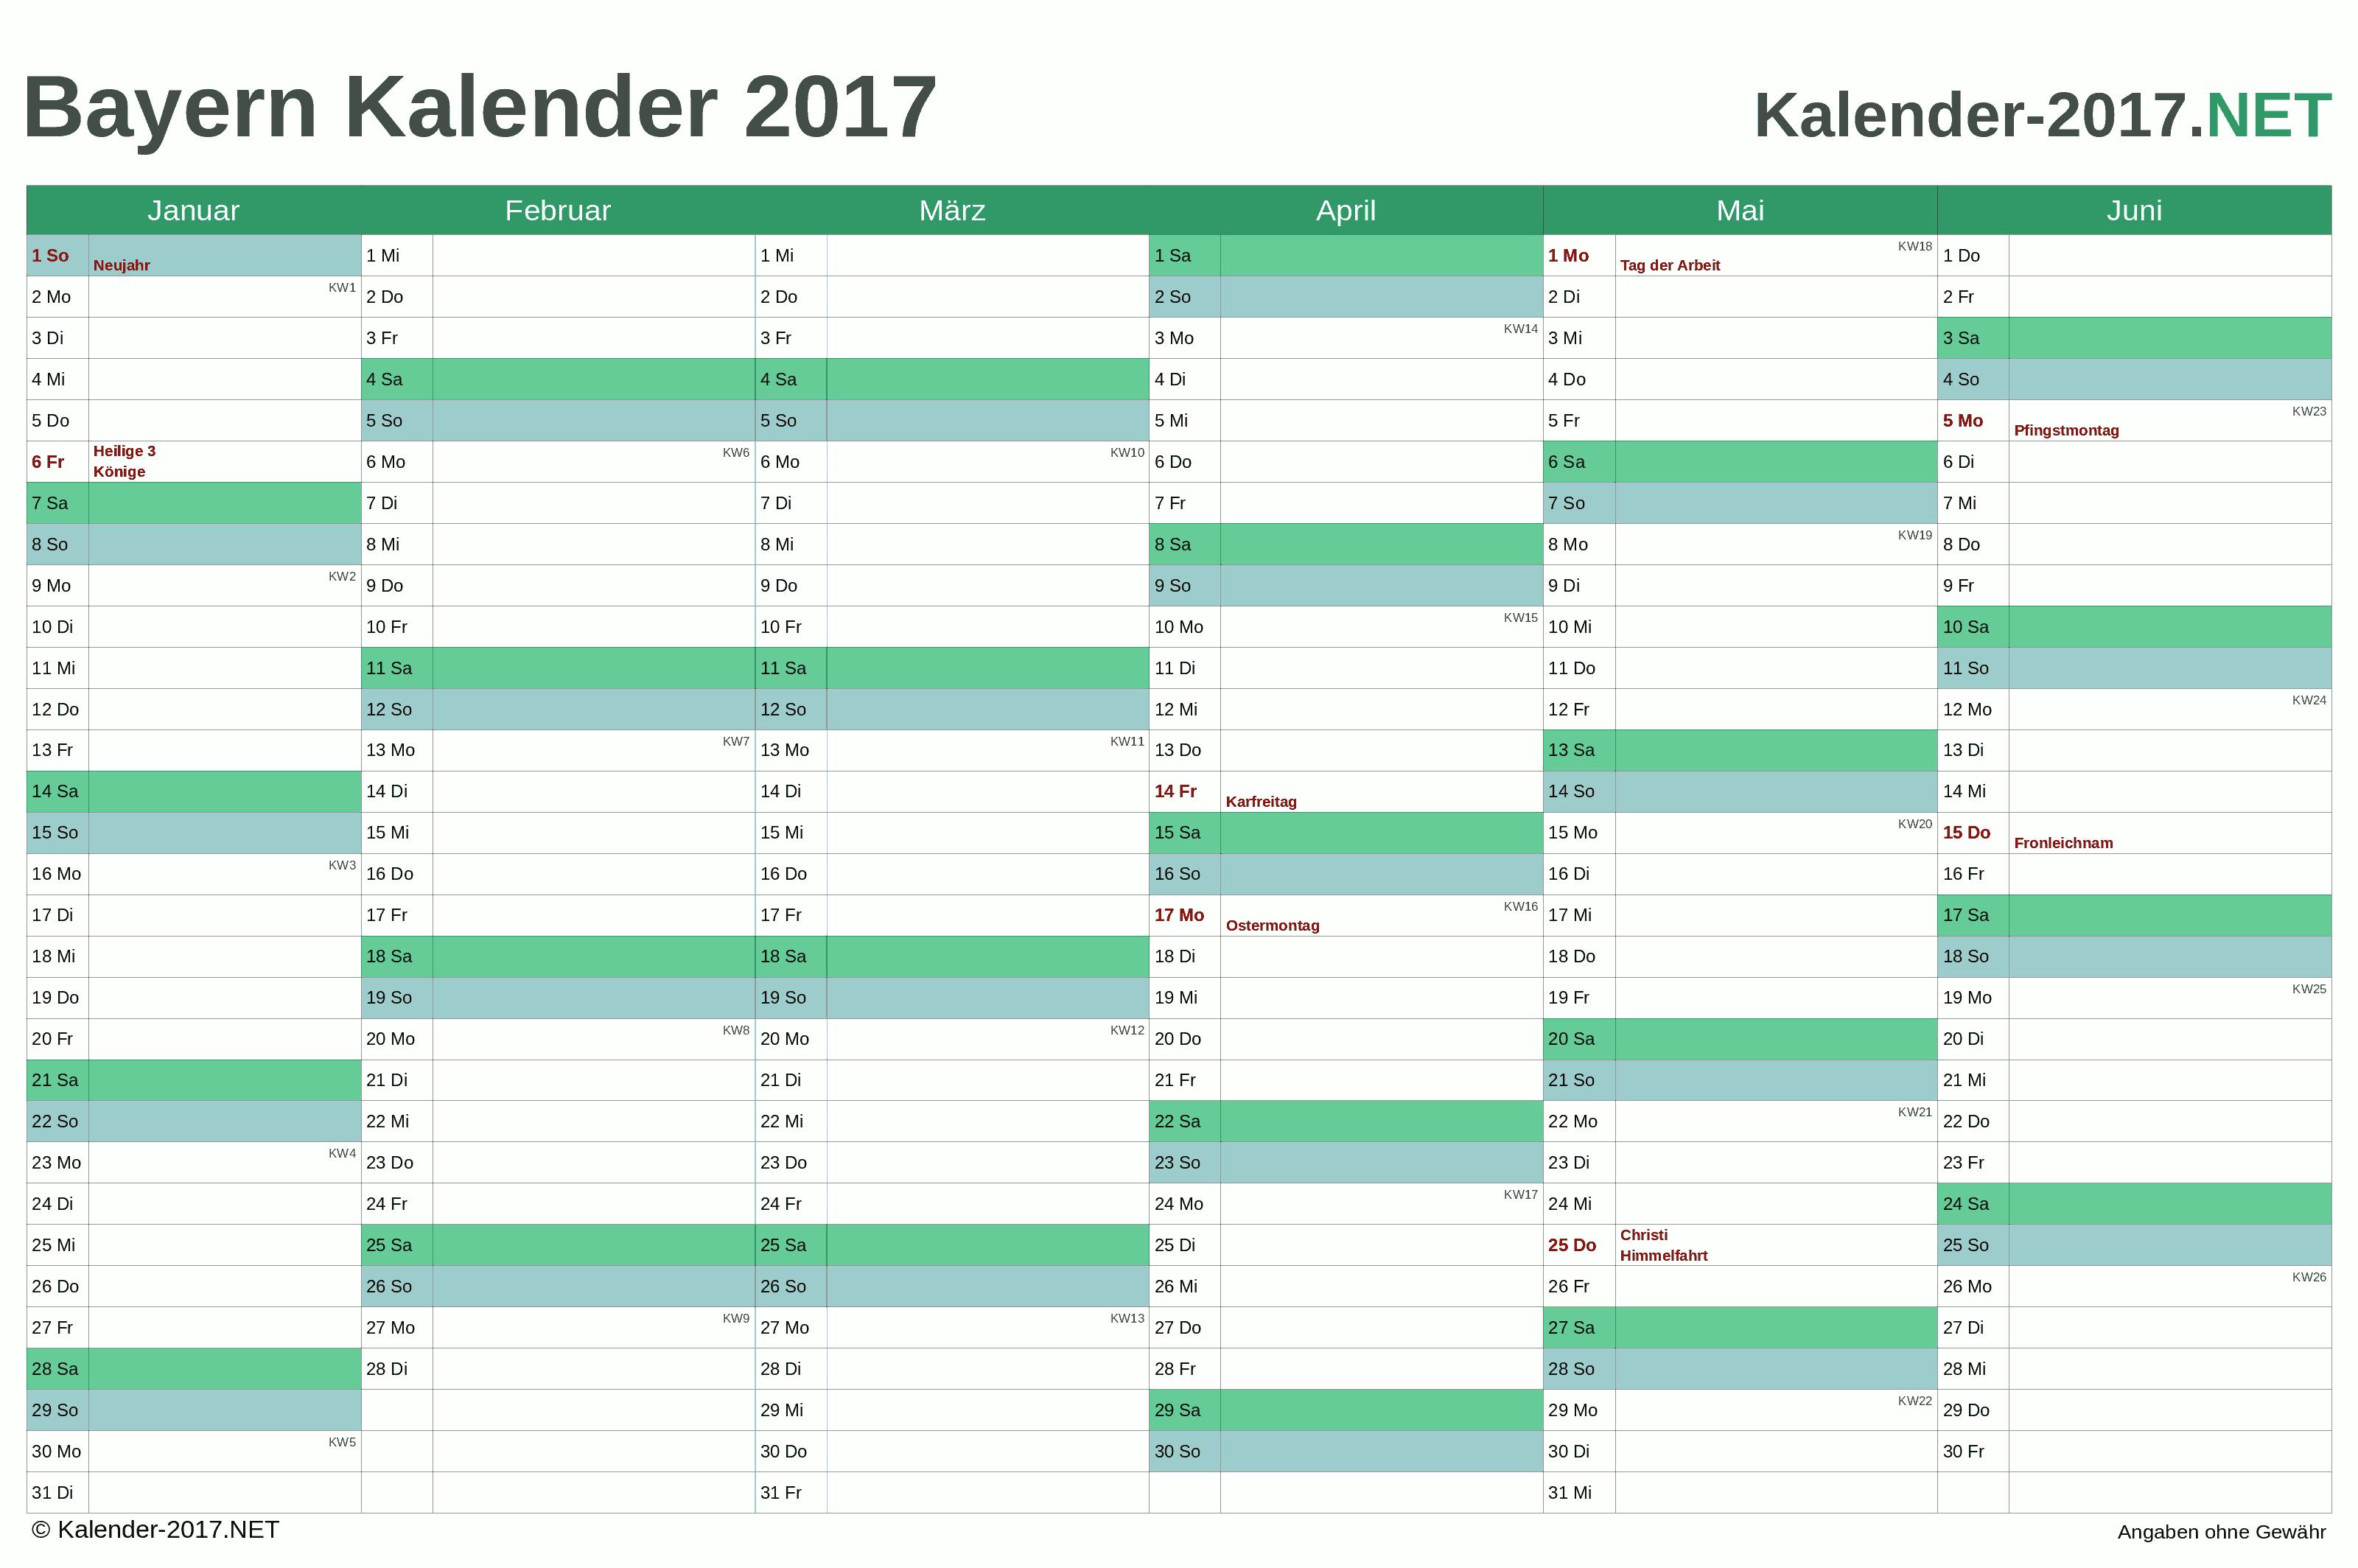 Bayern Halbjahreskalender 2017